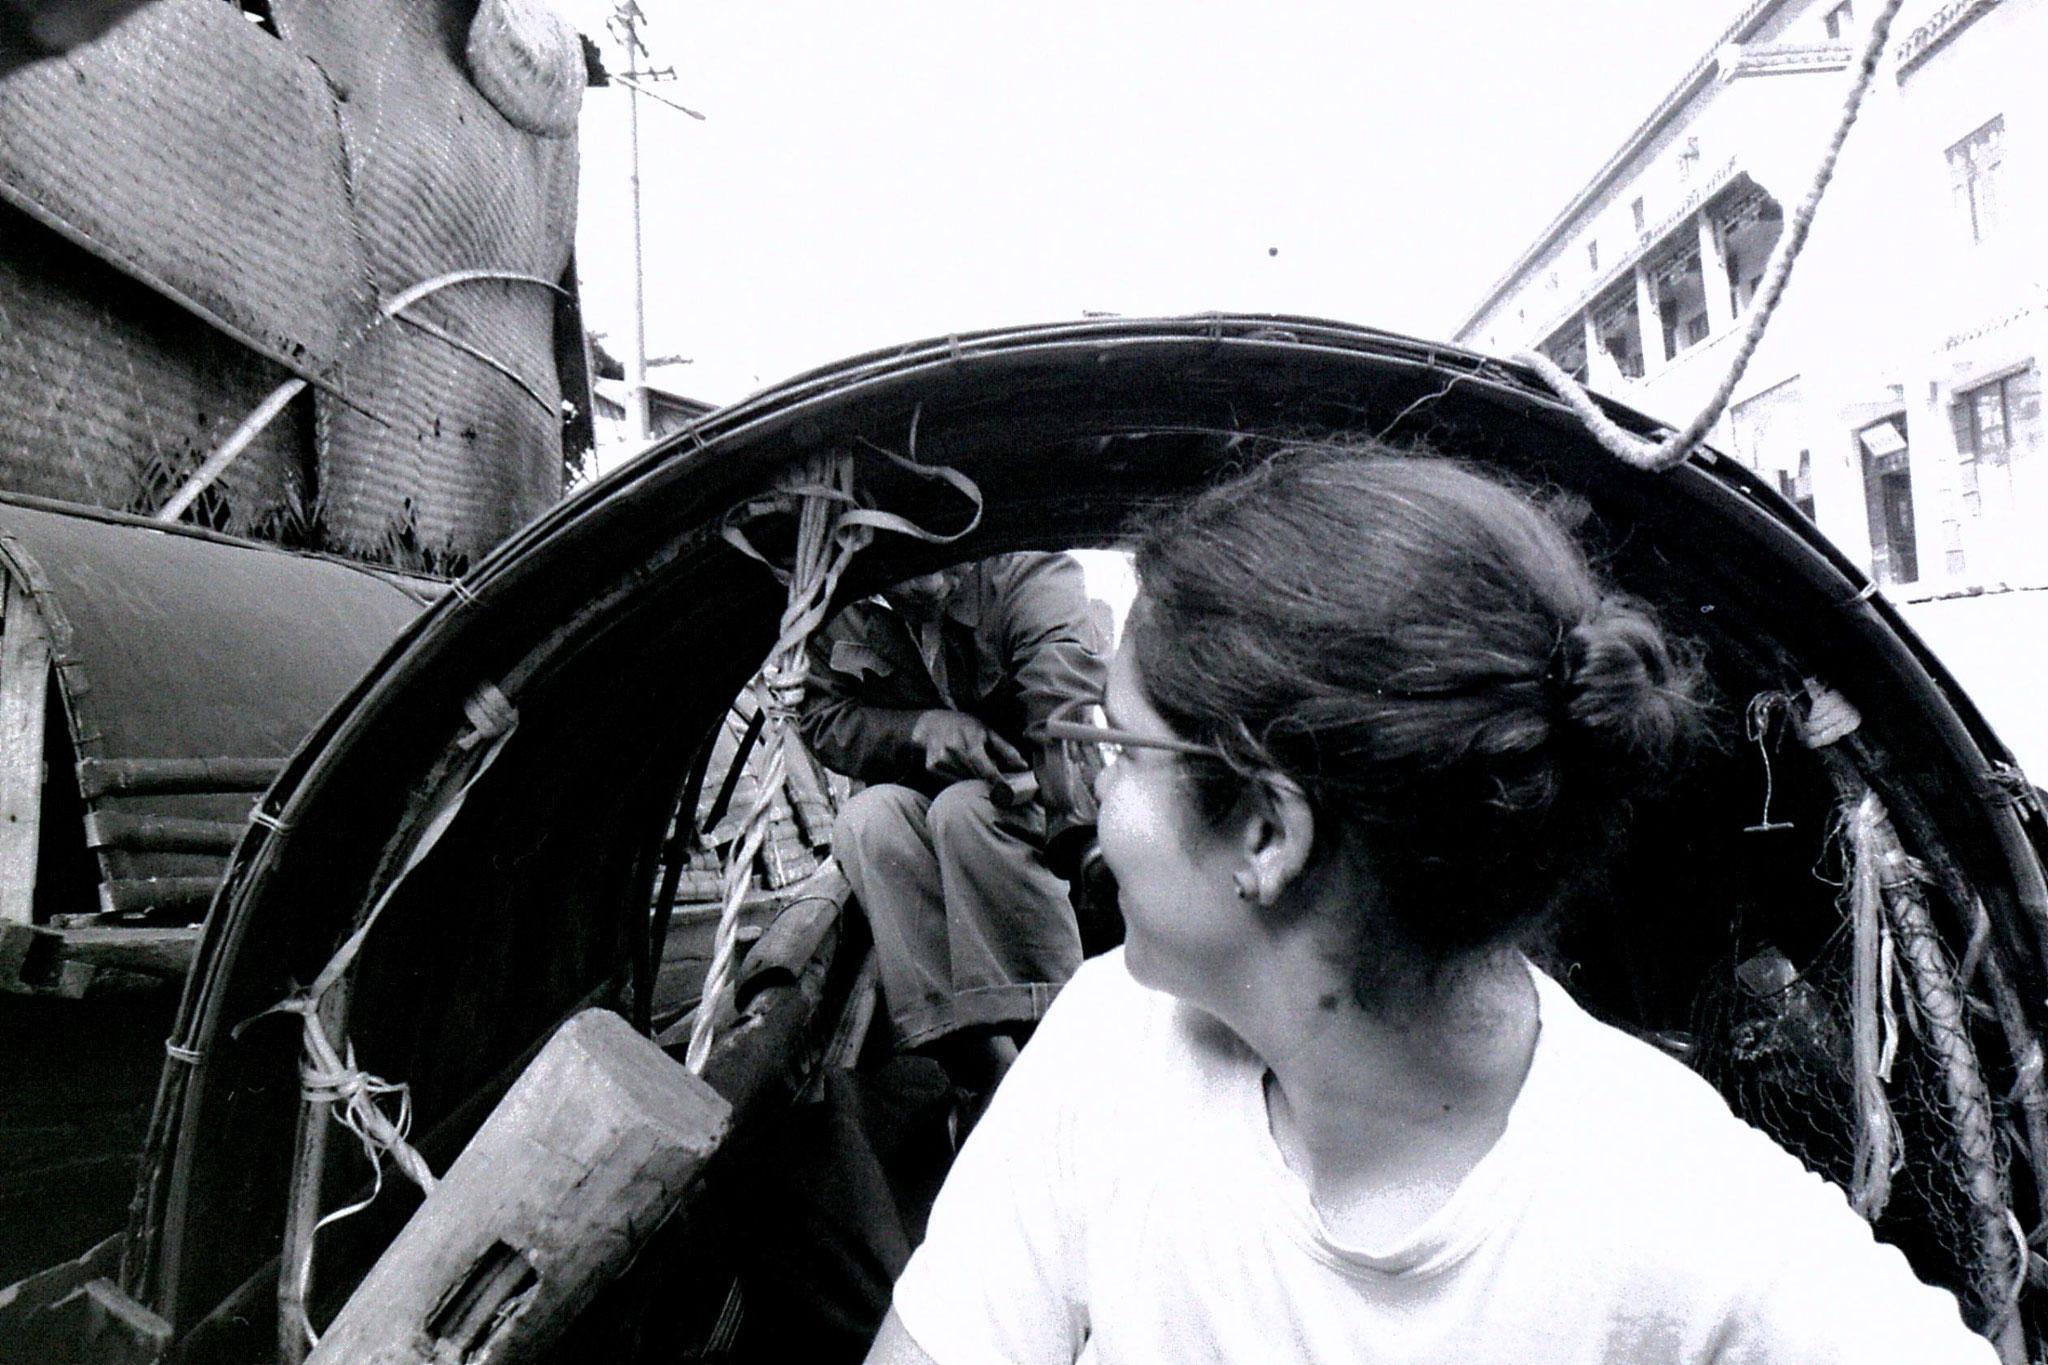 3/6/1989: 15: Keqiao